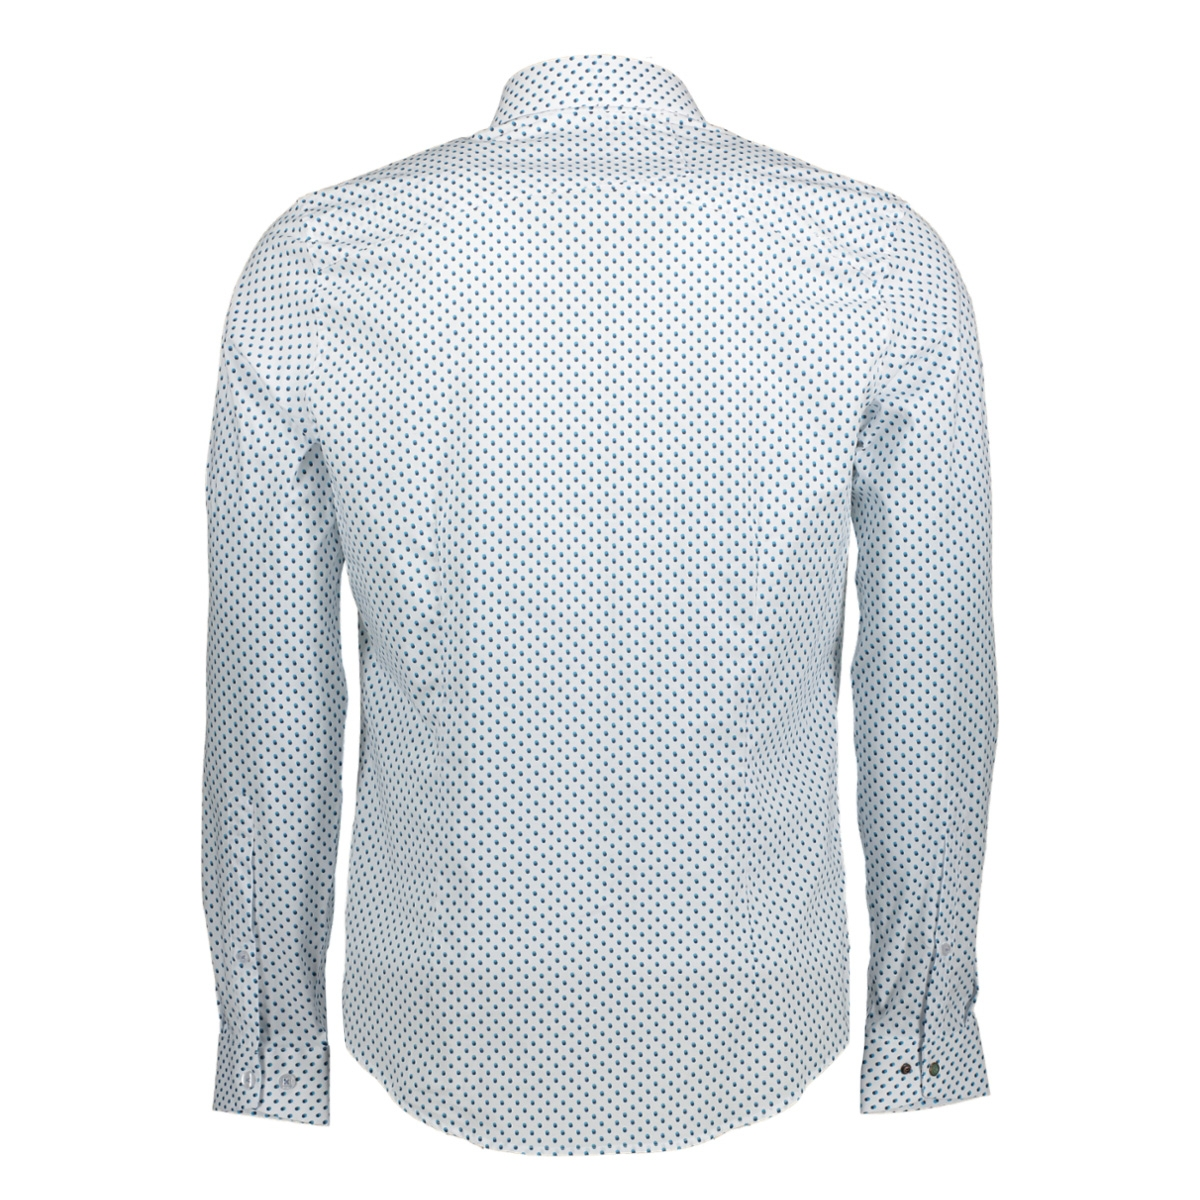 csi181606 cast iron overhemd 900